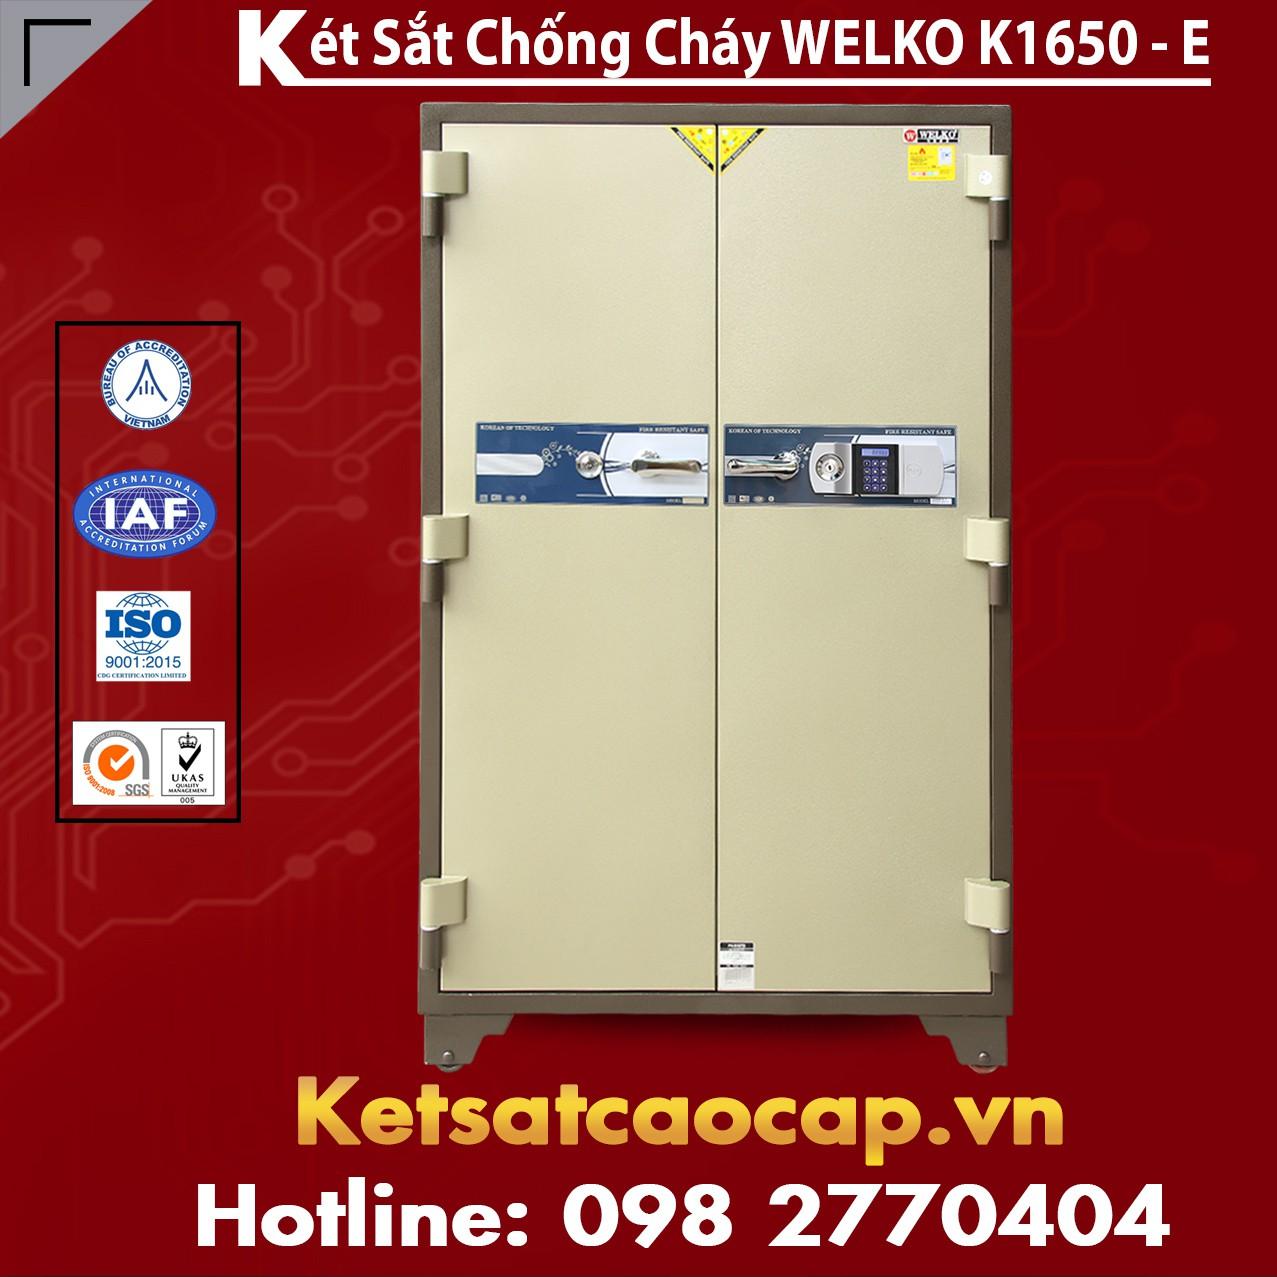 Két Sắt Chống Cháy Welko K1650 - E Silver